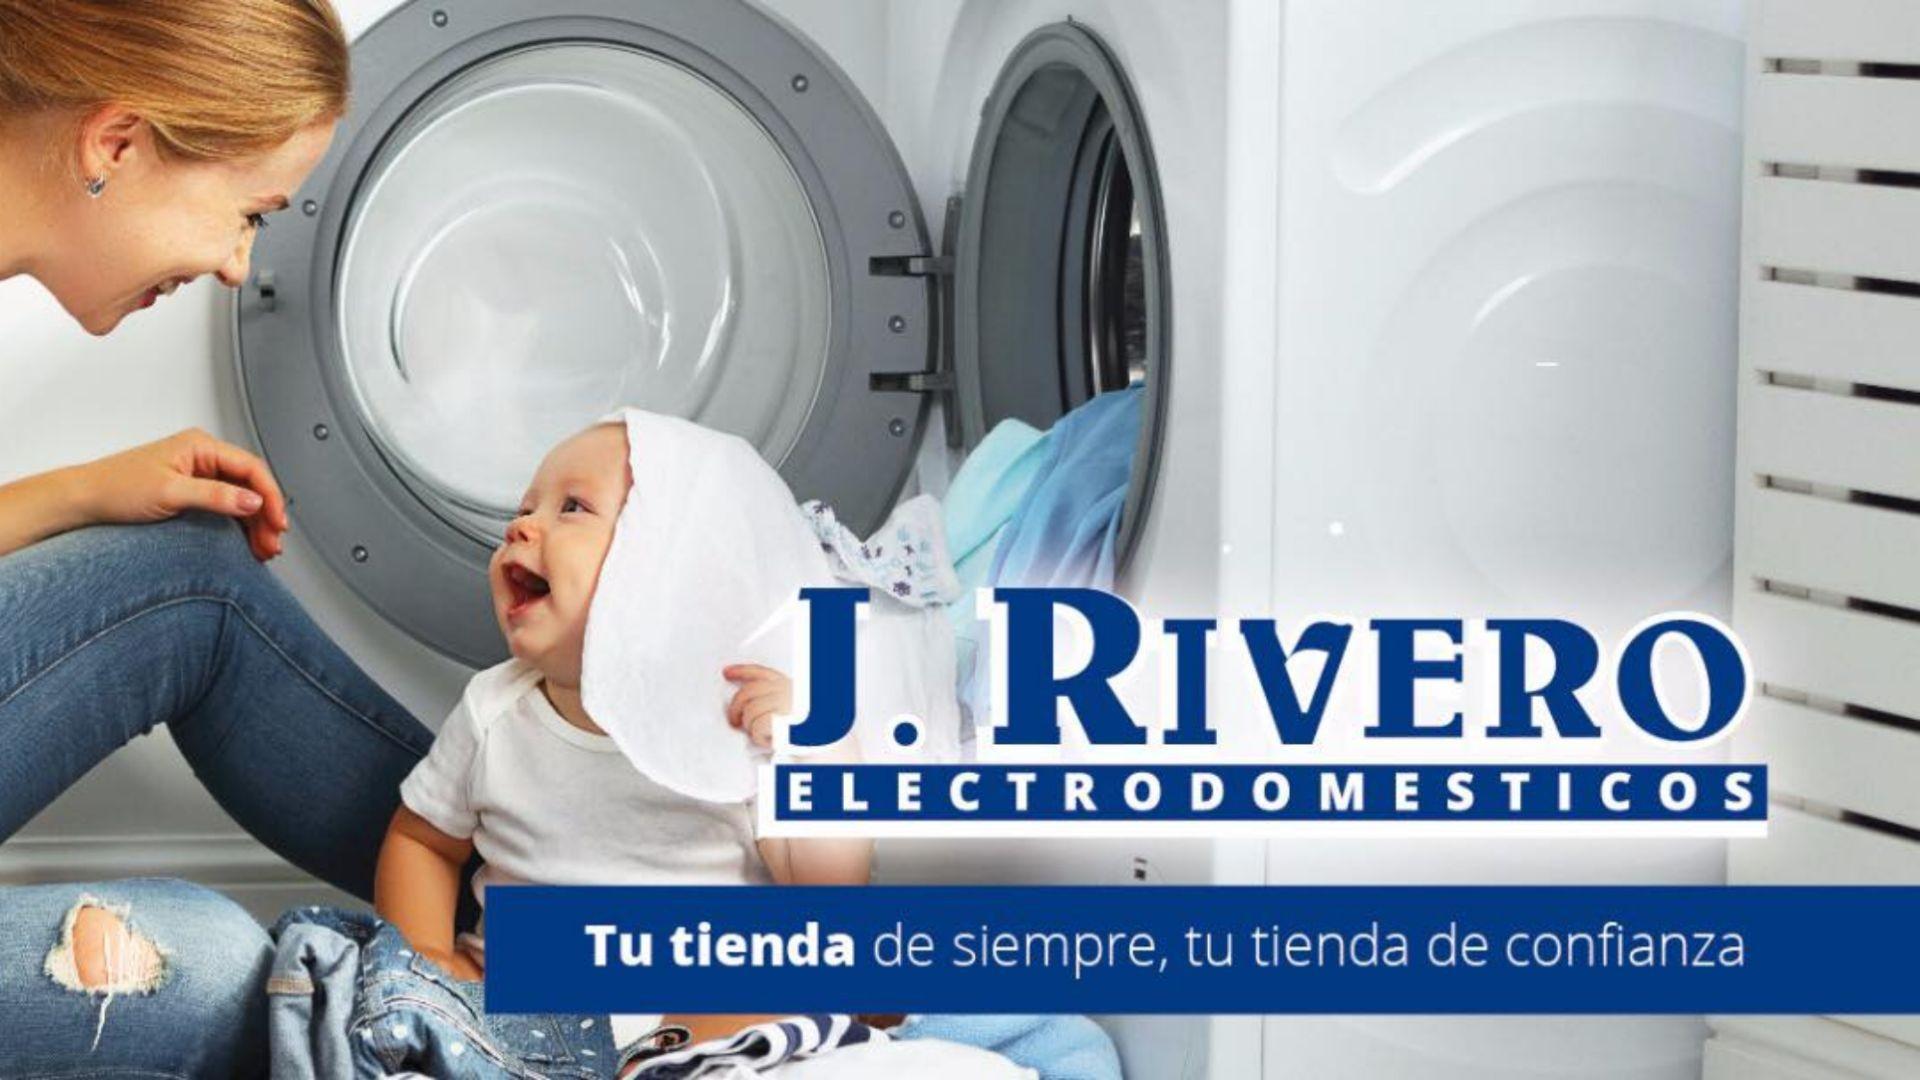 electrodomesticos j